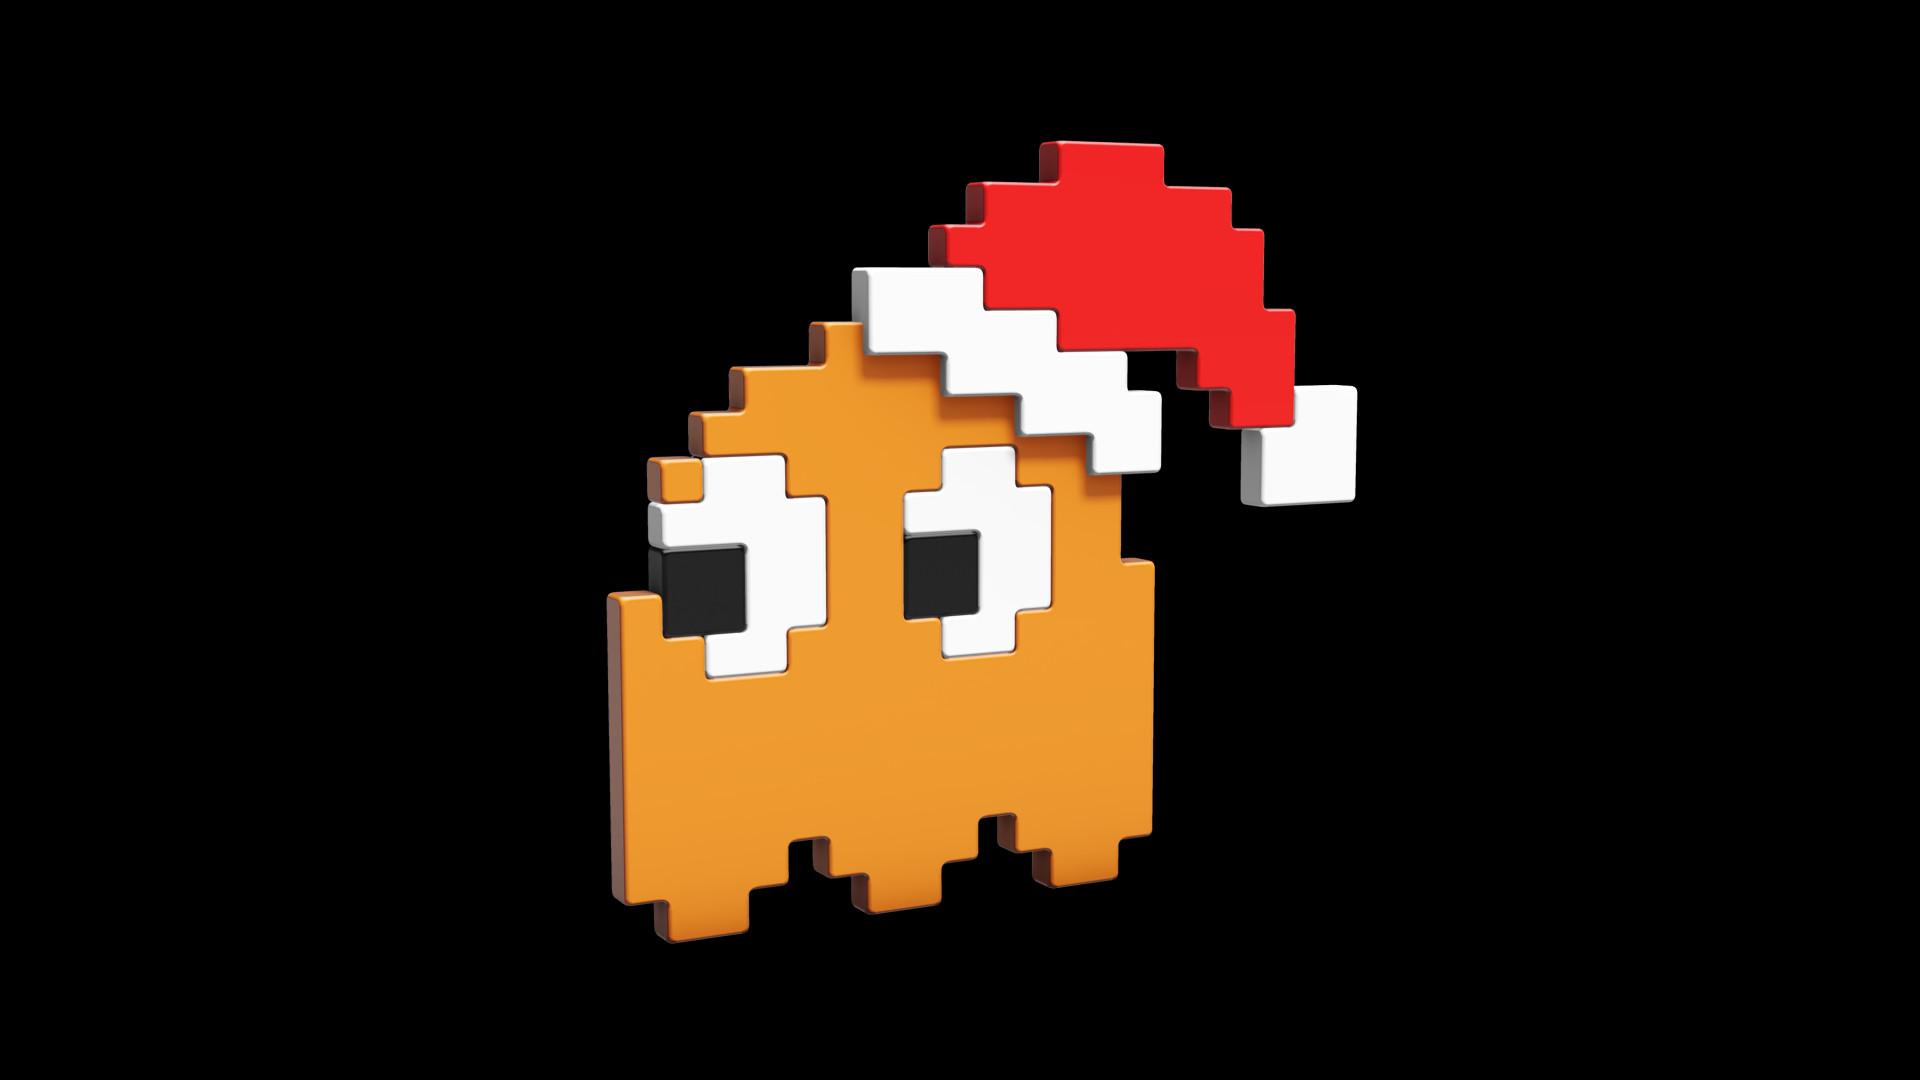 Pac Man Ghost Wallpaper - Christmas Edition